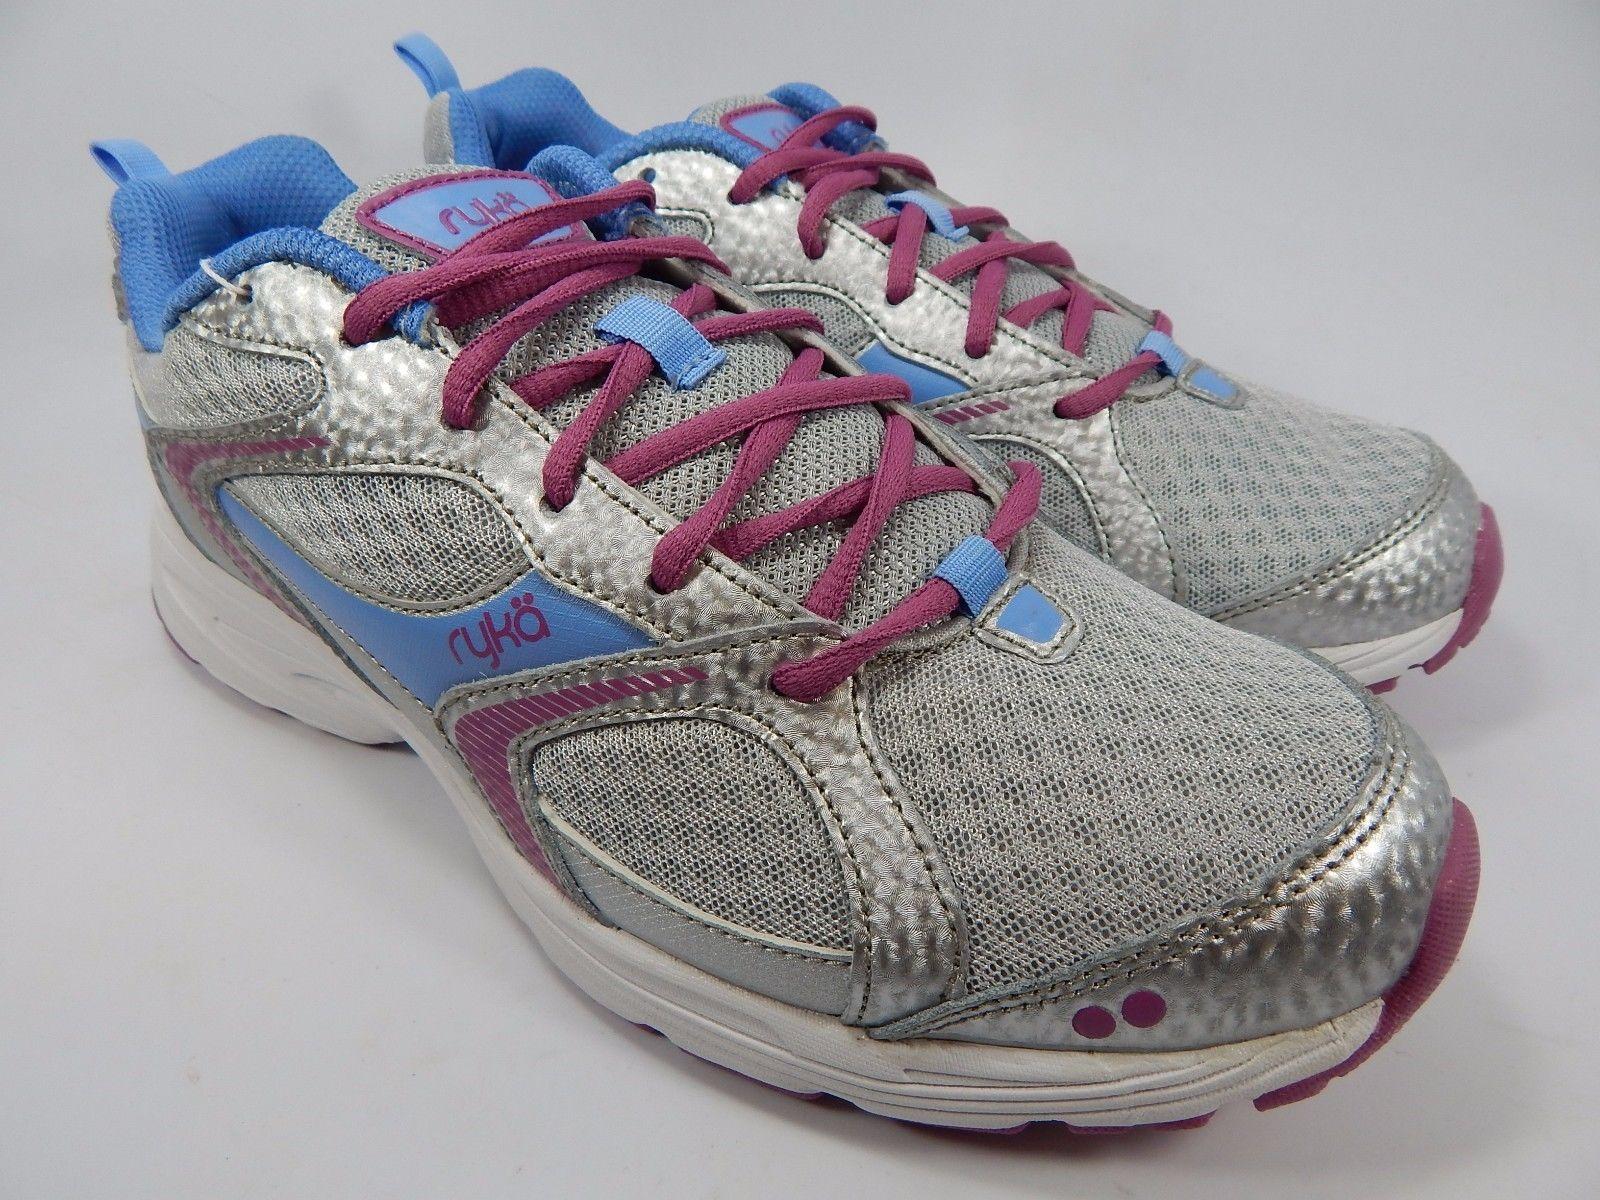 Ryka Streak SMR Women's Running Shoes Size US 10 M (B) EU 41.5 Silver Pink Blue